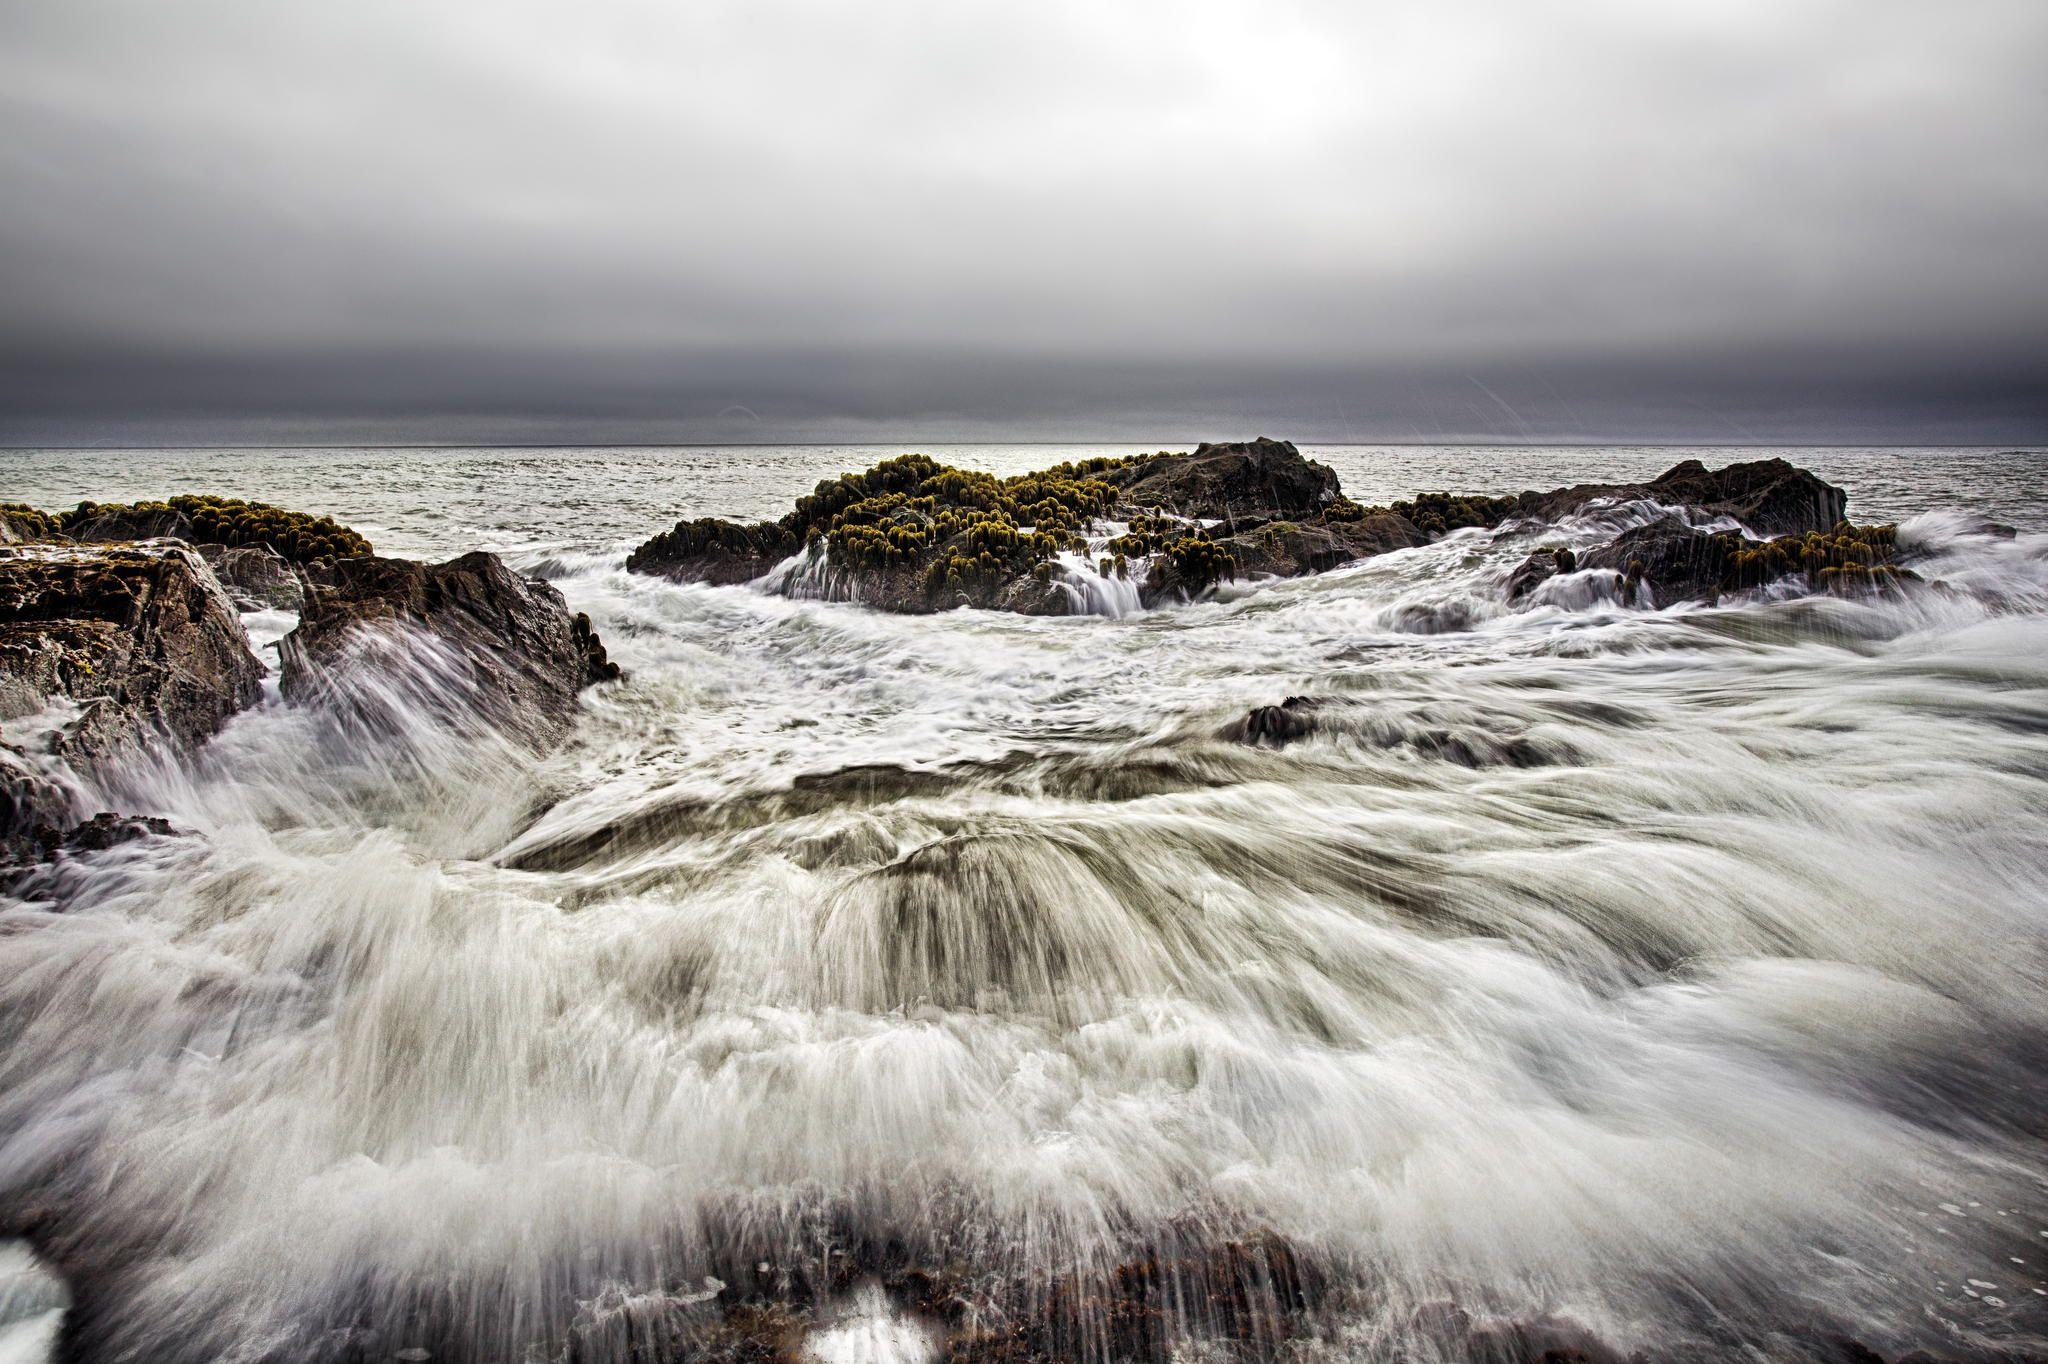 Wet Feet, Pescadero State Park, California by Daniel Chui on 500px